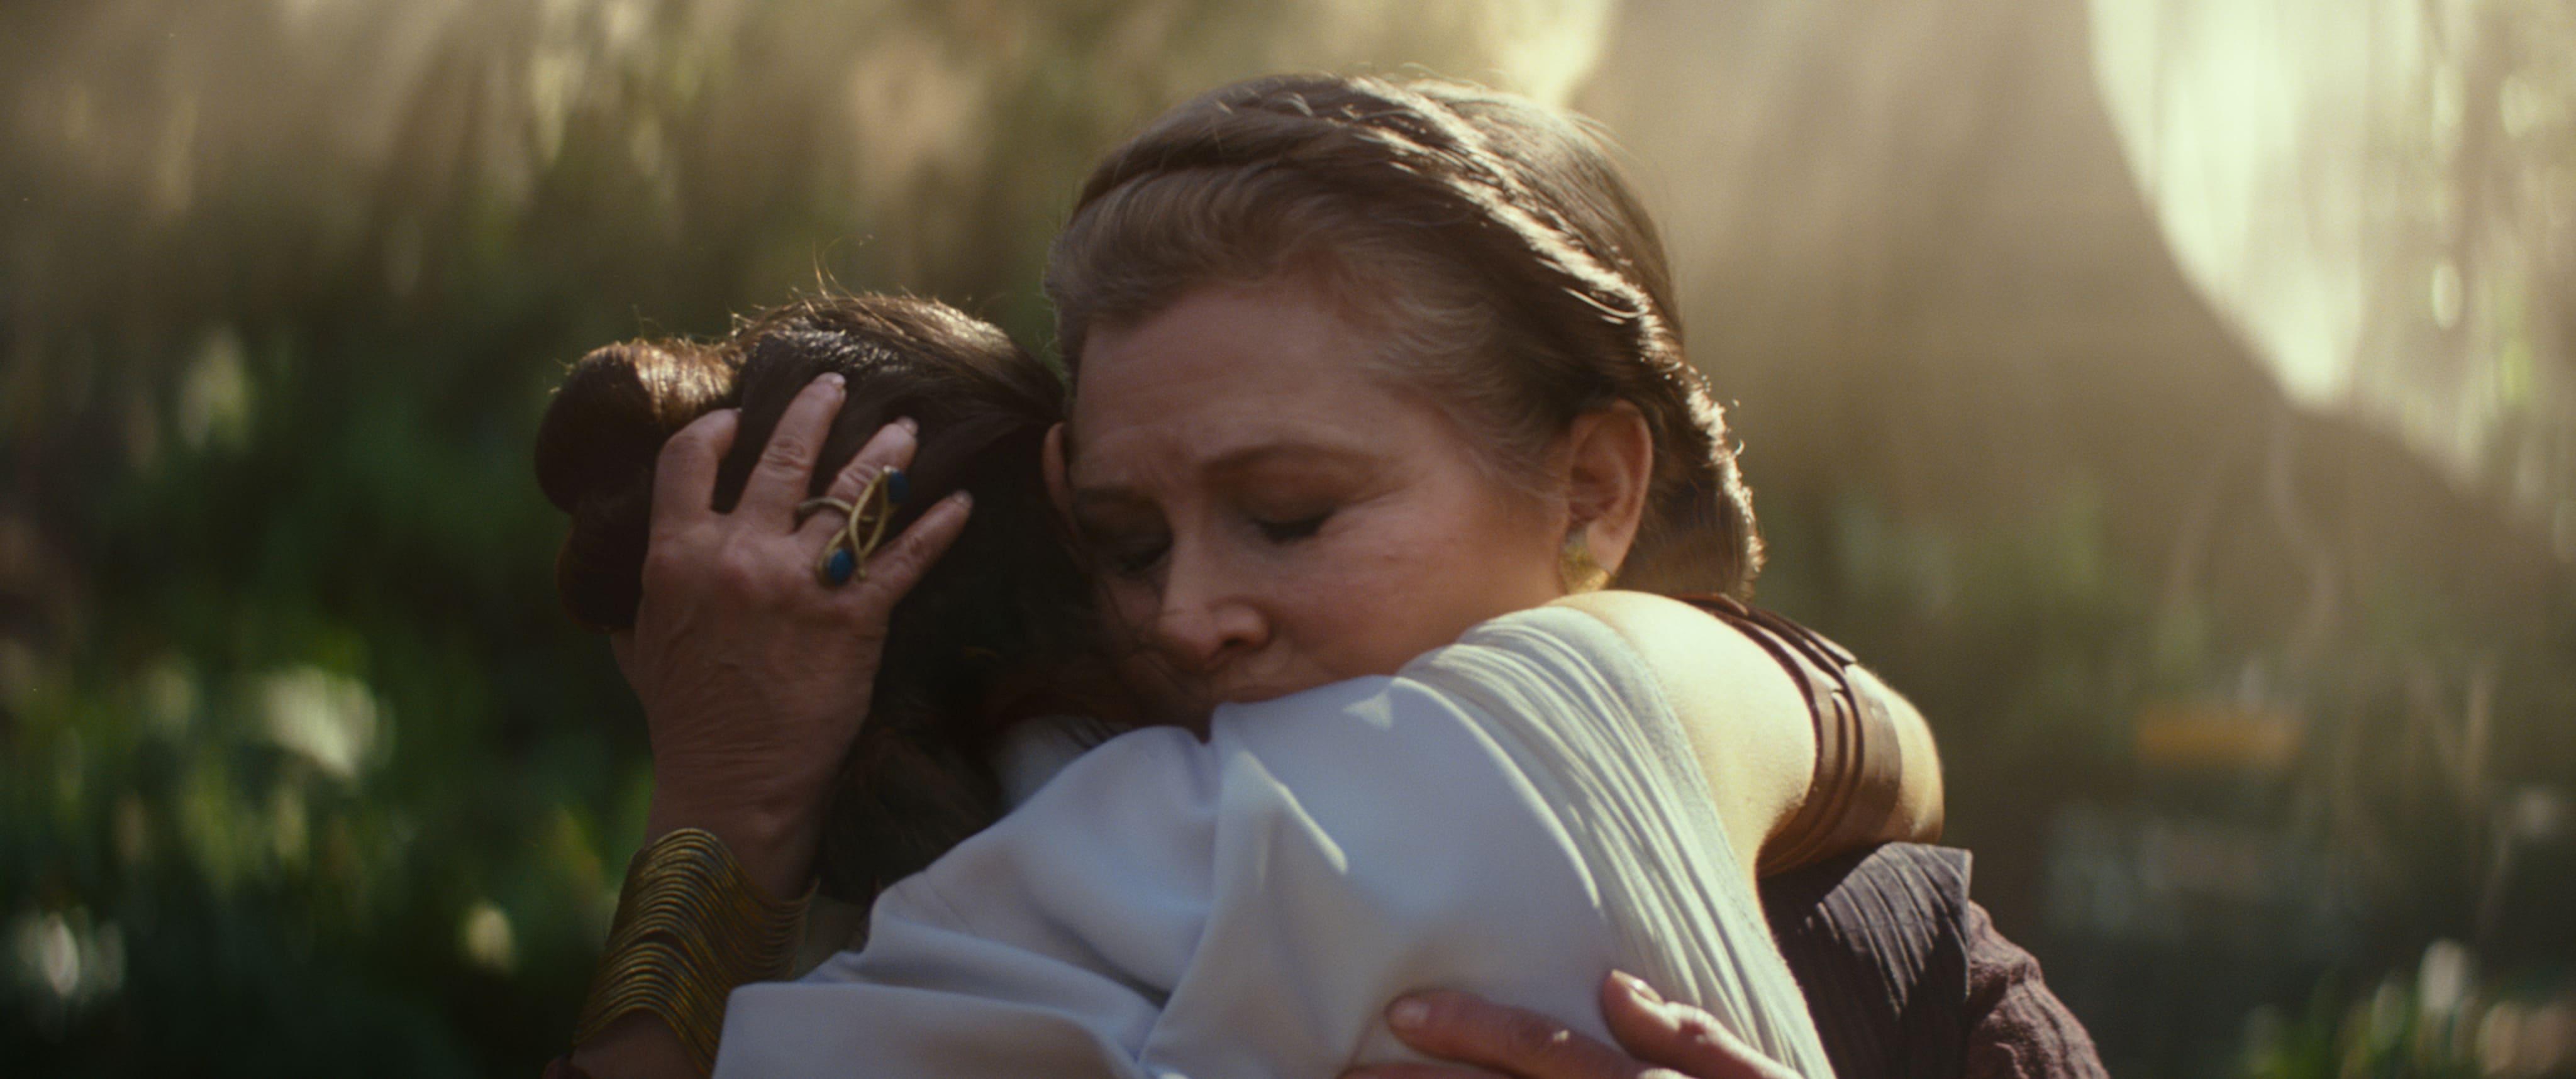 Star Wars Episode 9 What We Know So Far, Episode IX Leia